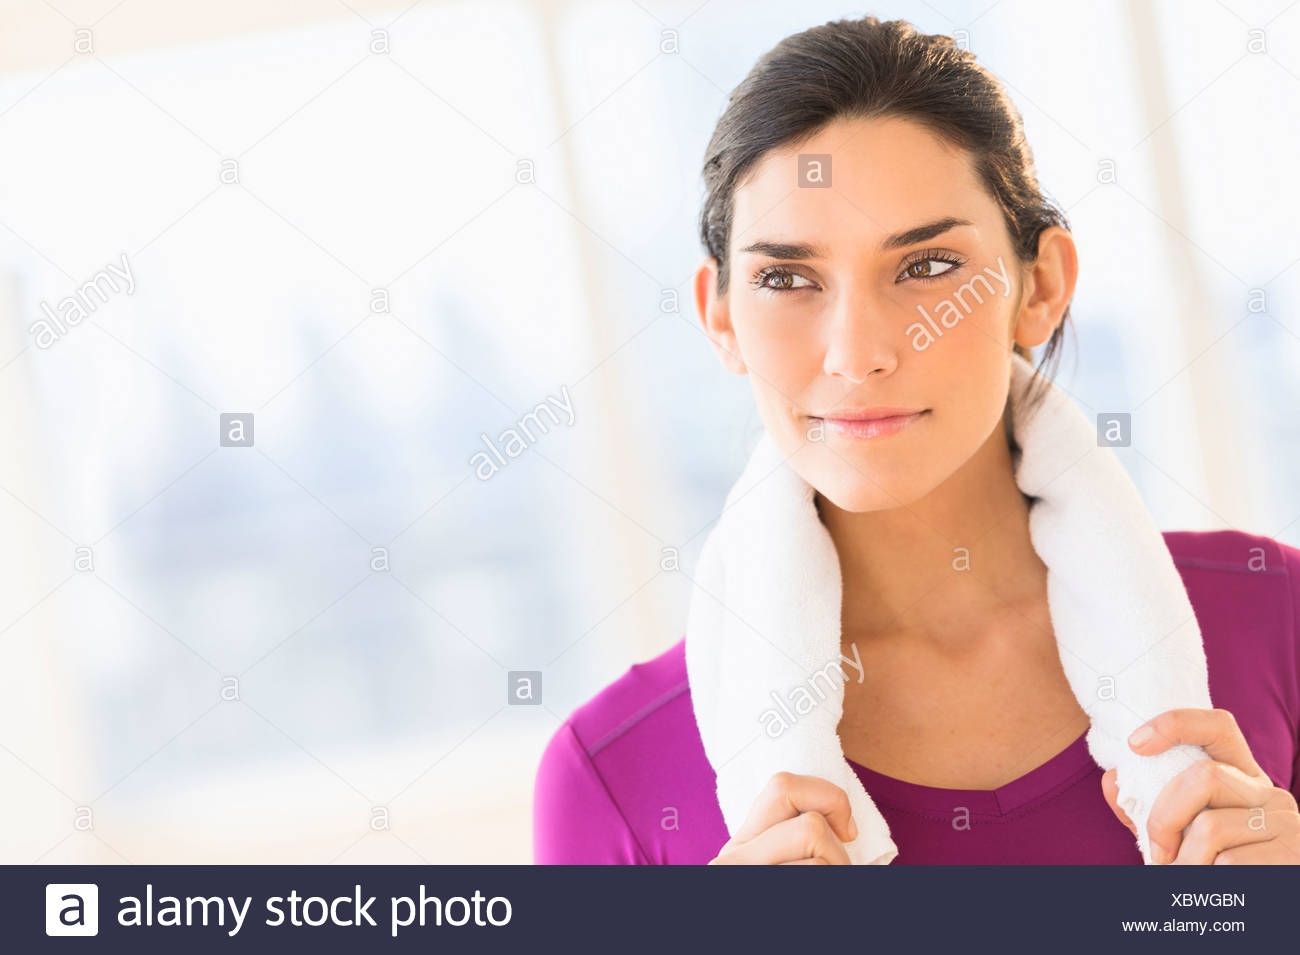 Junge Frau, die Ausübung Stockbild